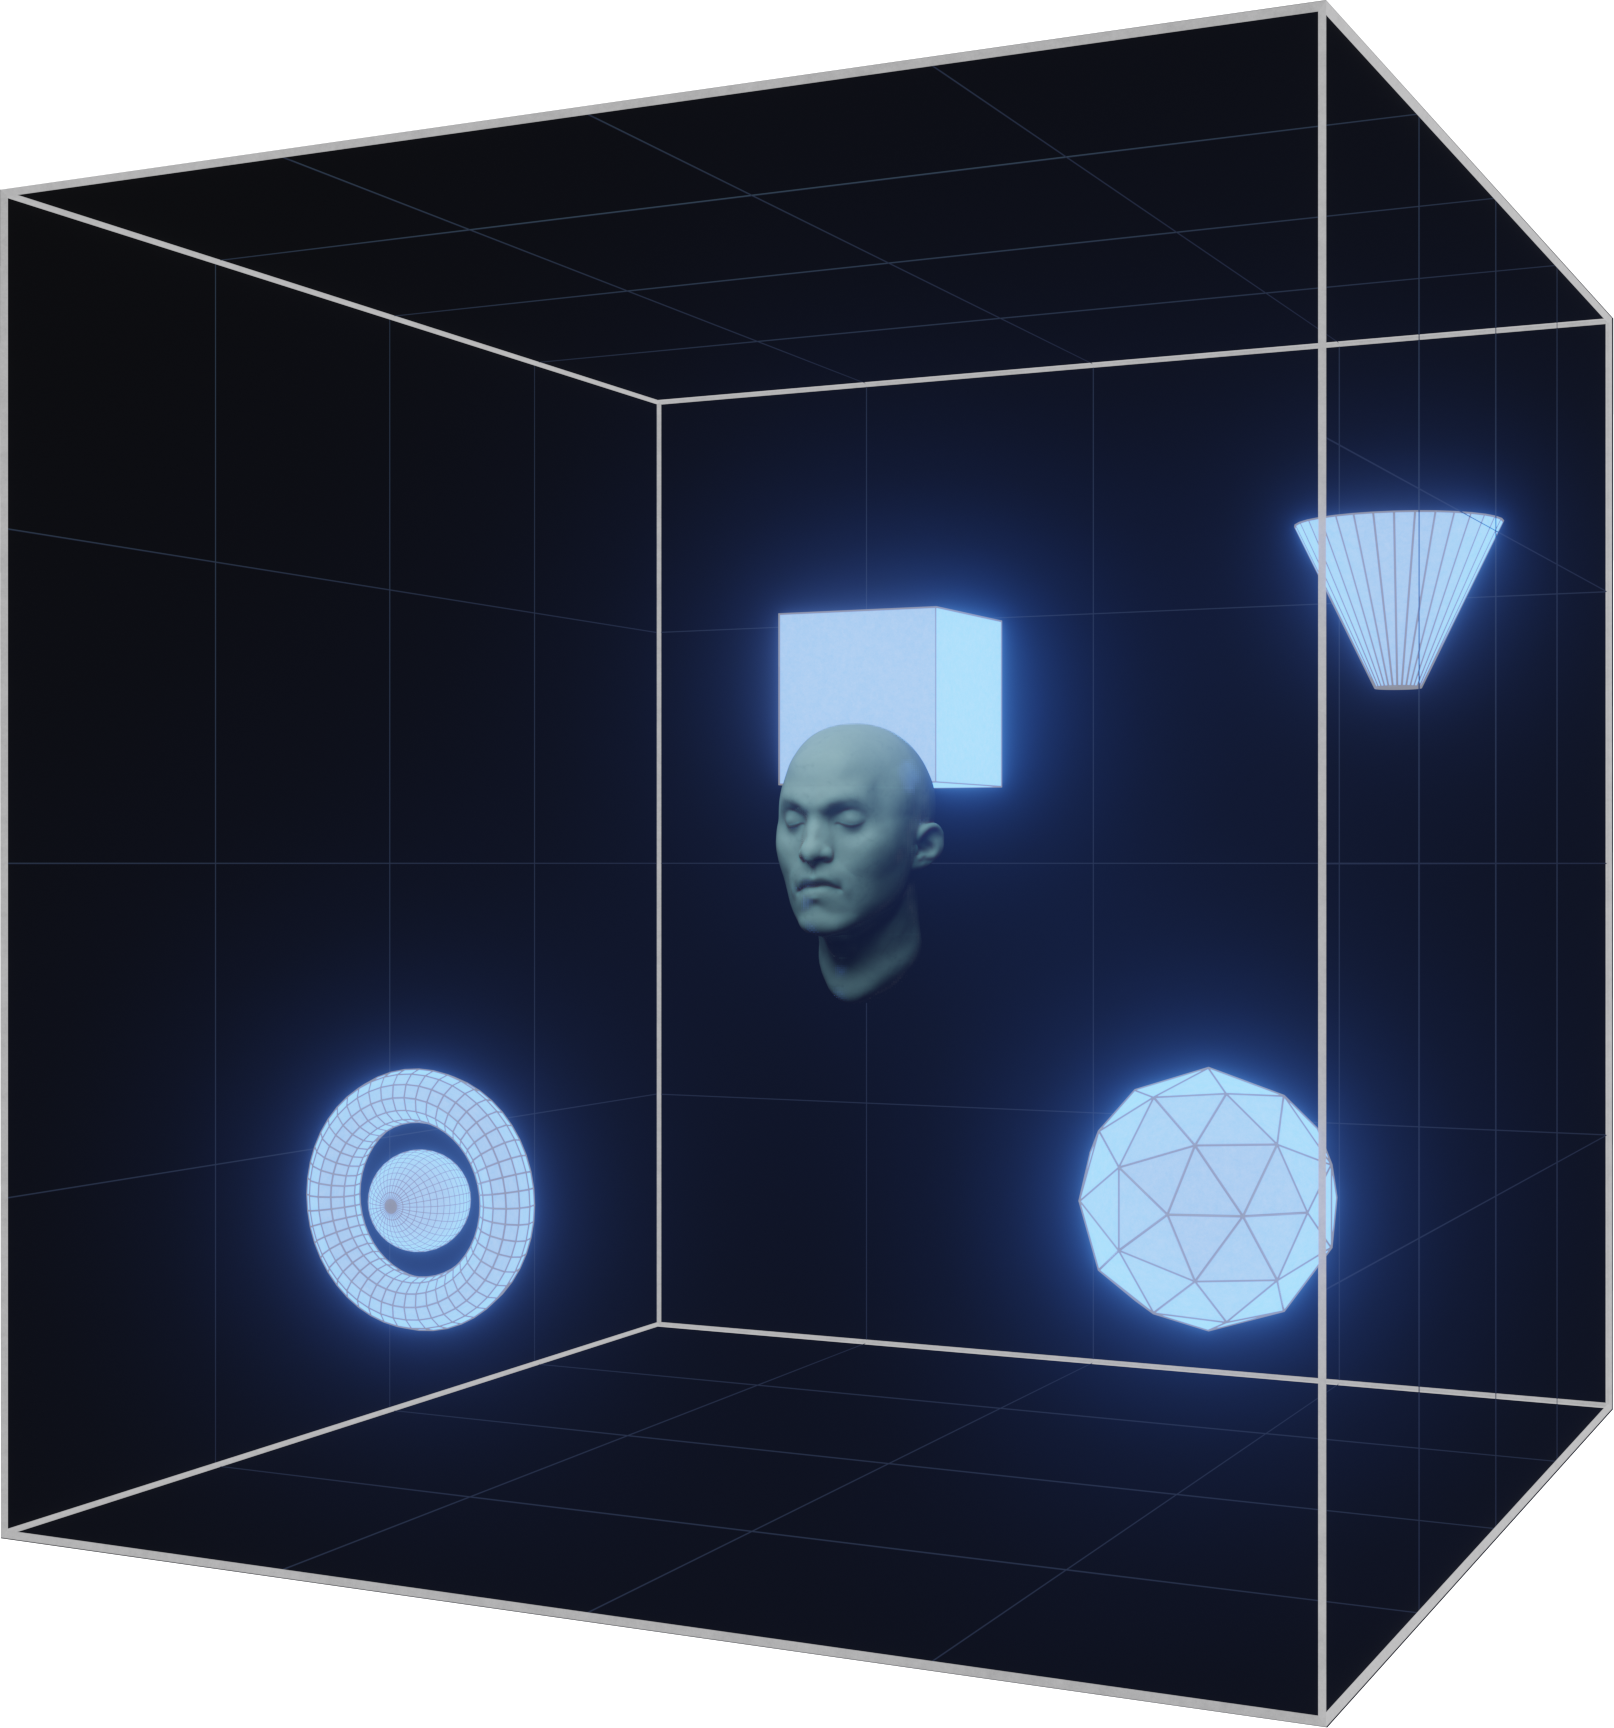 Roundhead spatial audio.